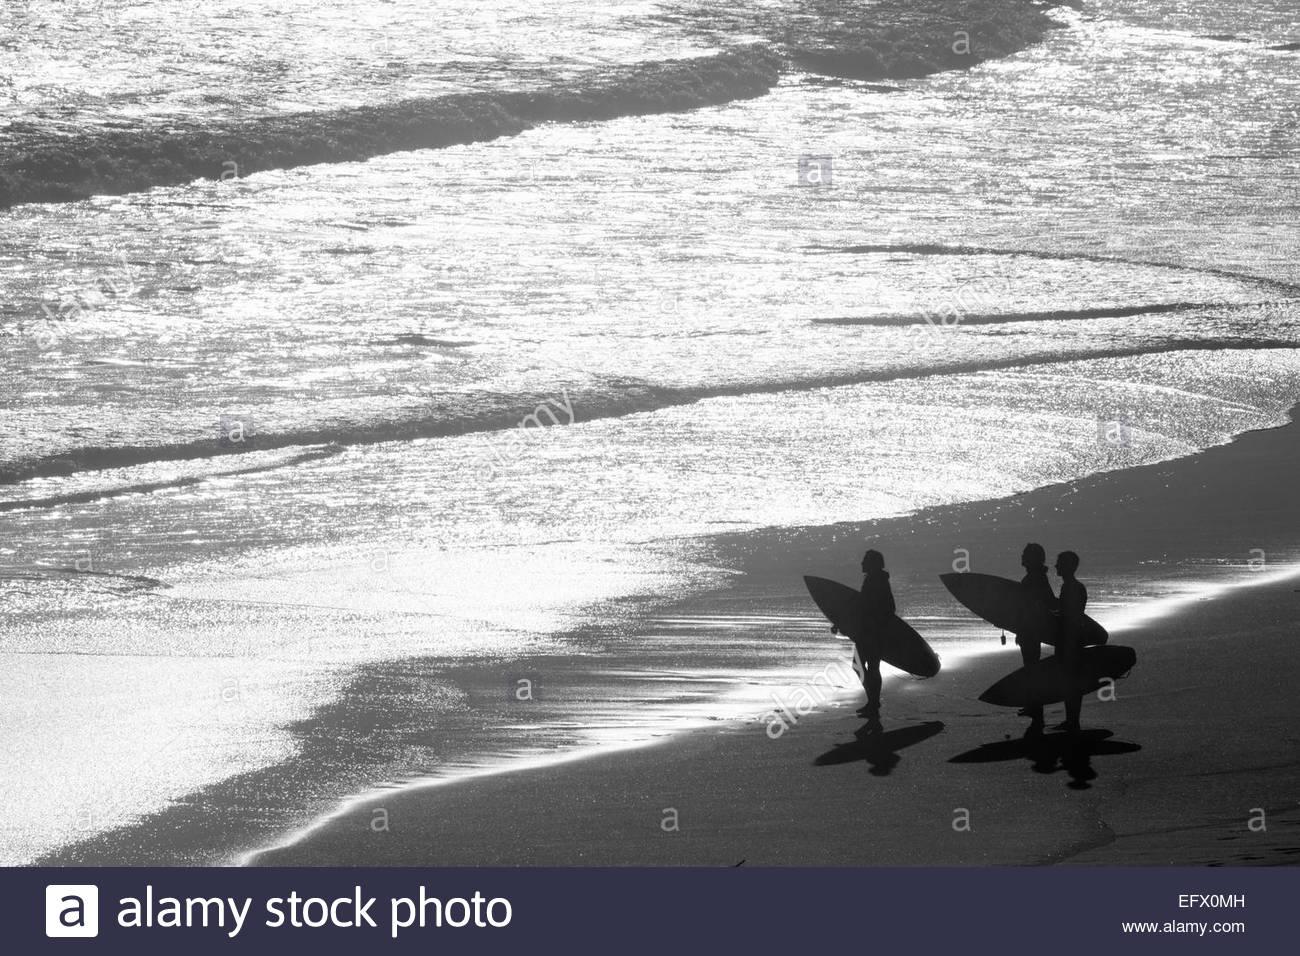 Groupe de Surfers carrying surf boards regardant la mer Photo Stock